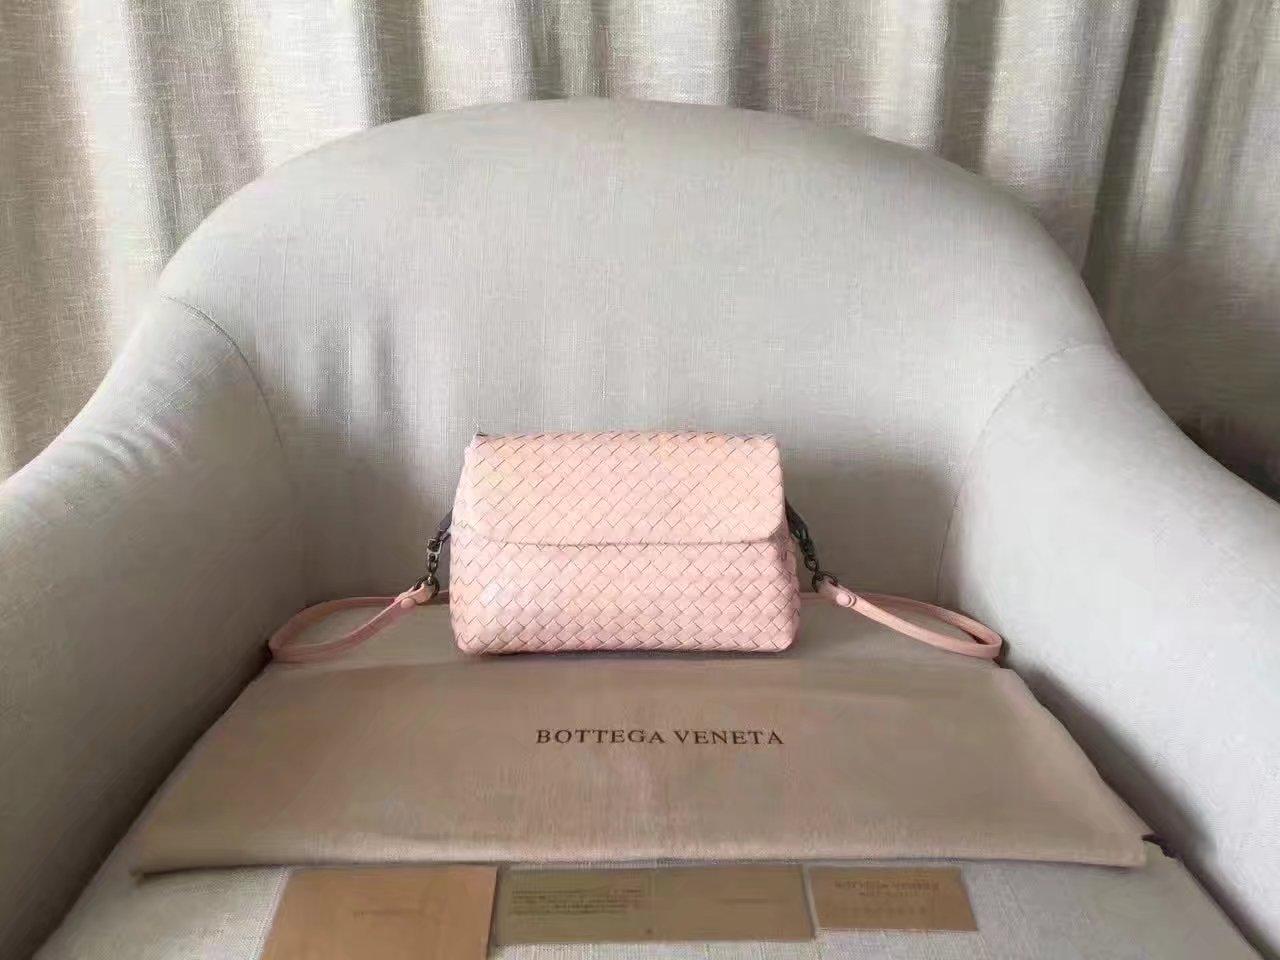 Bottega Veneta Baby Olimpia Bag in Glicine Intrecciato Nappa Leather